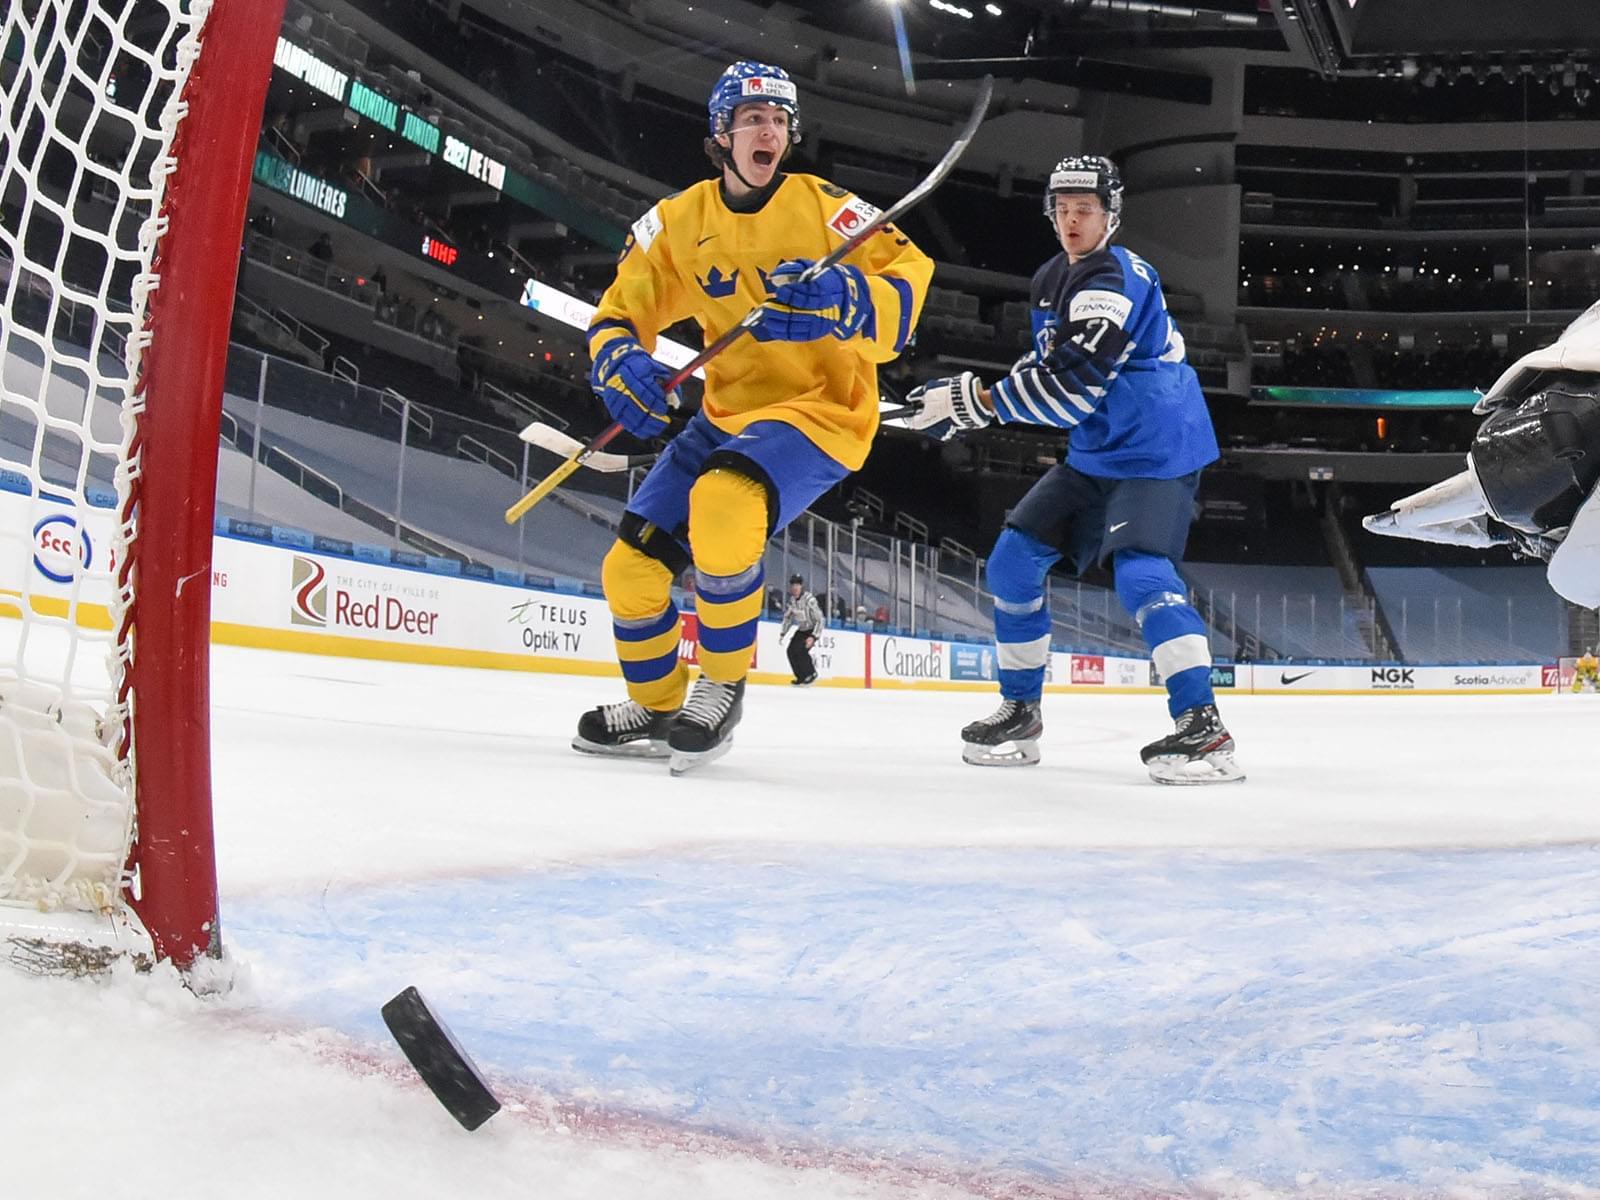 Ice hockey game.